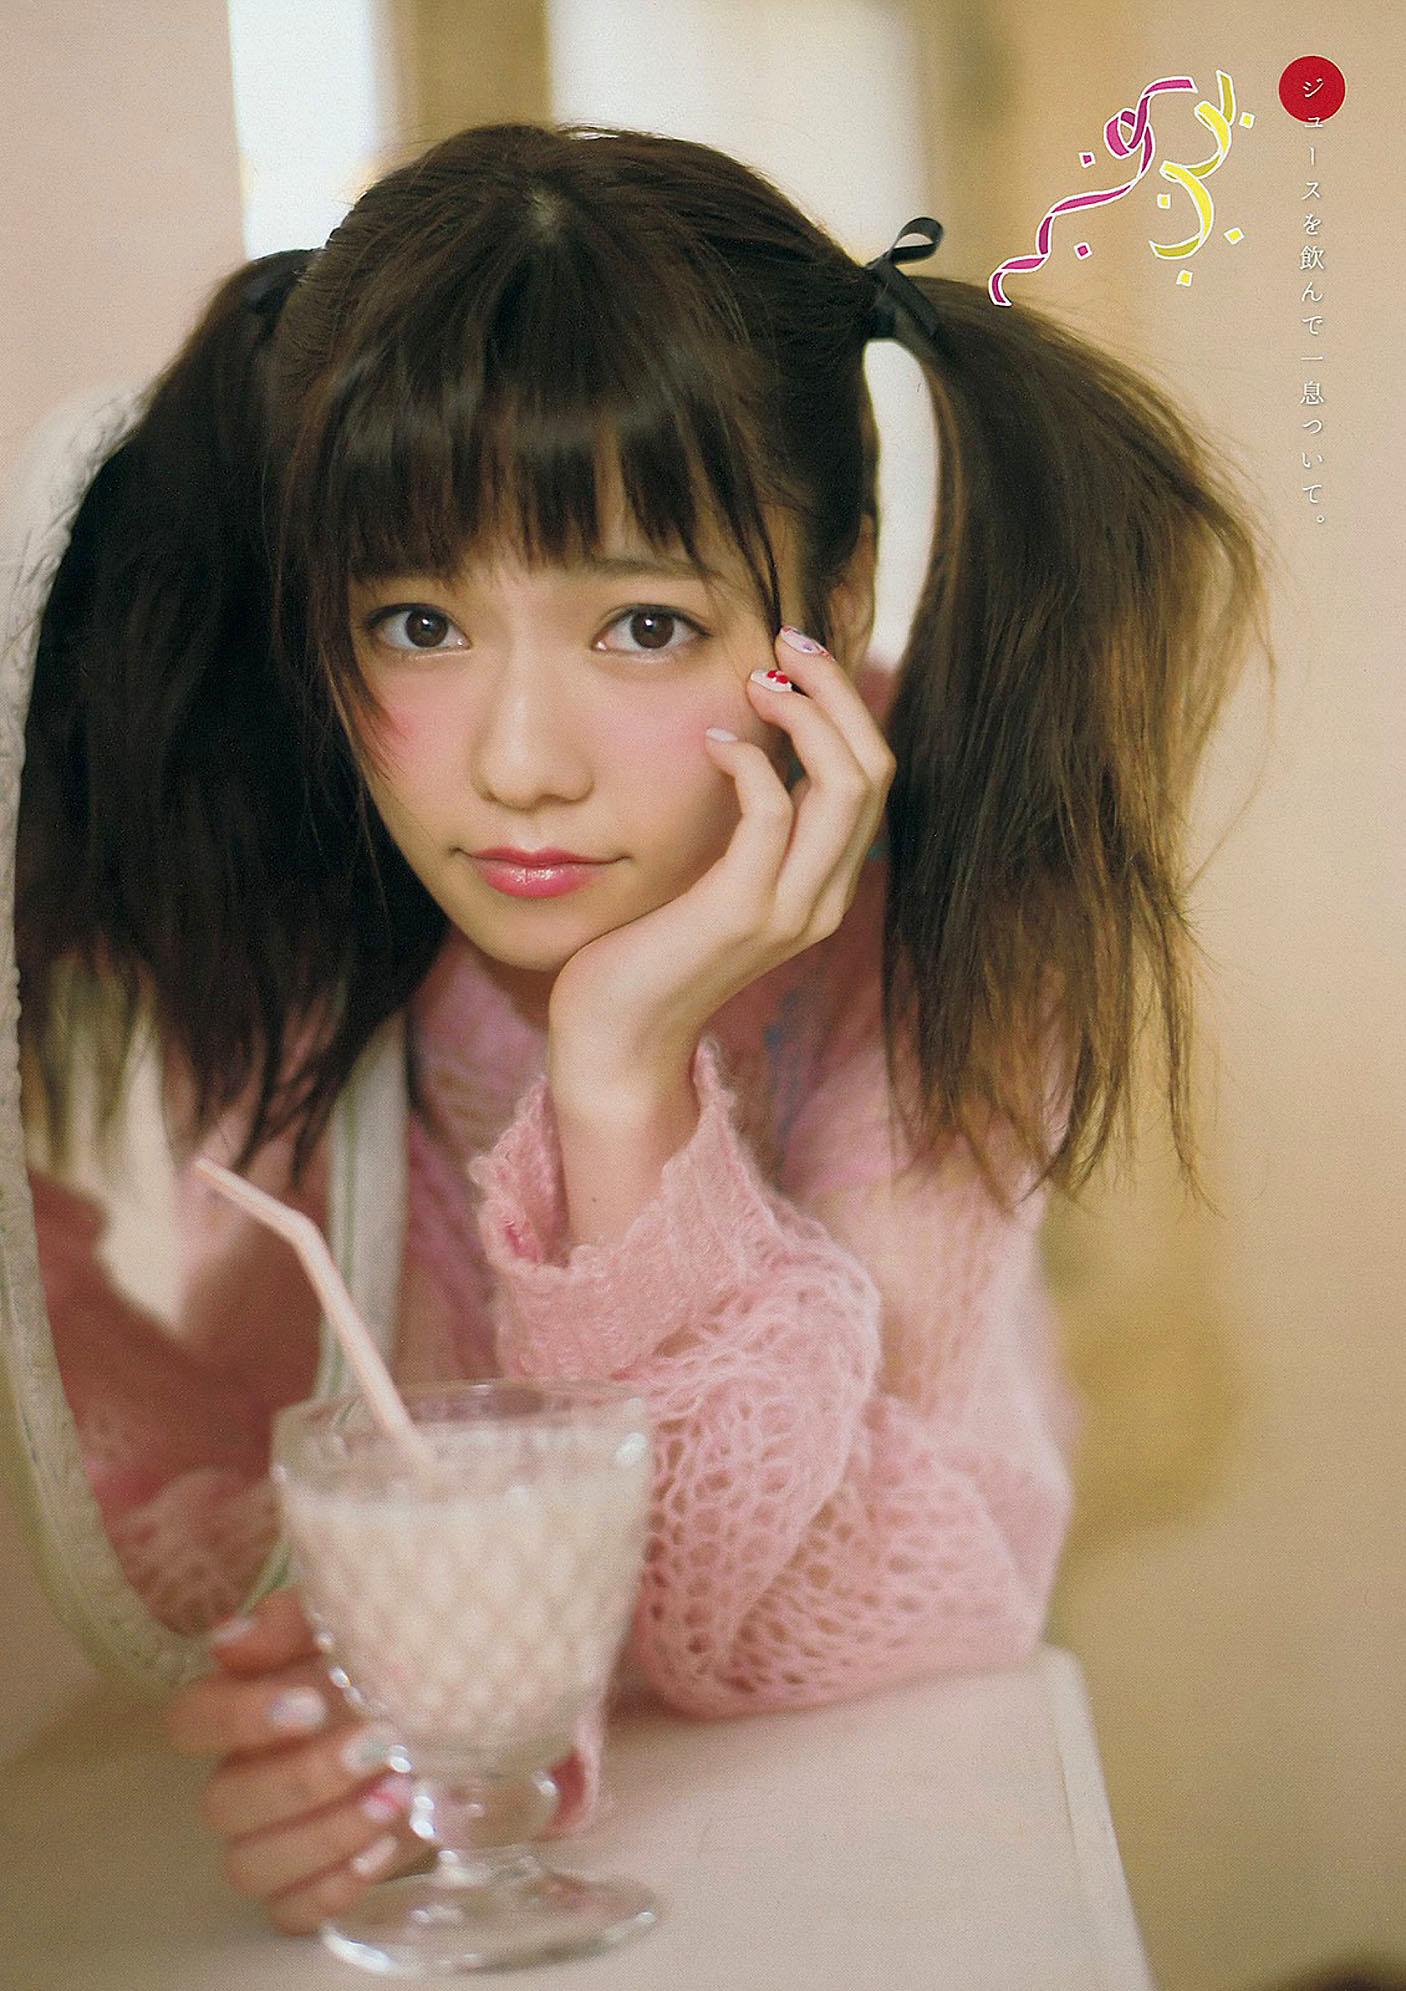 HShimazaki Young Magazine 141201 06.jpg